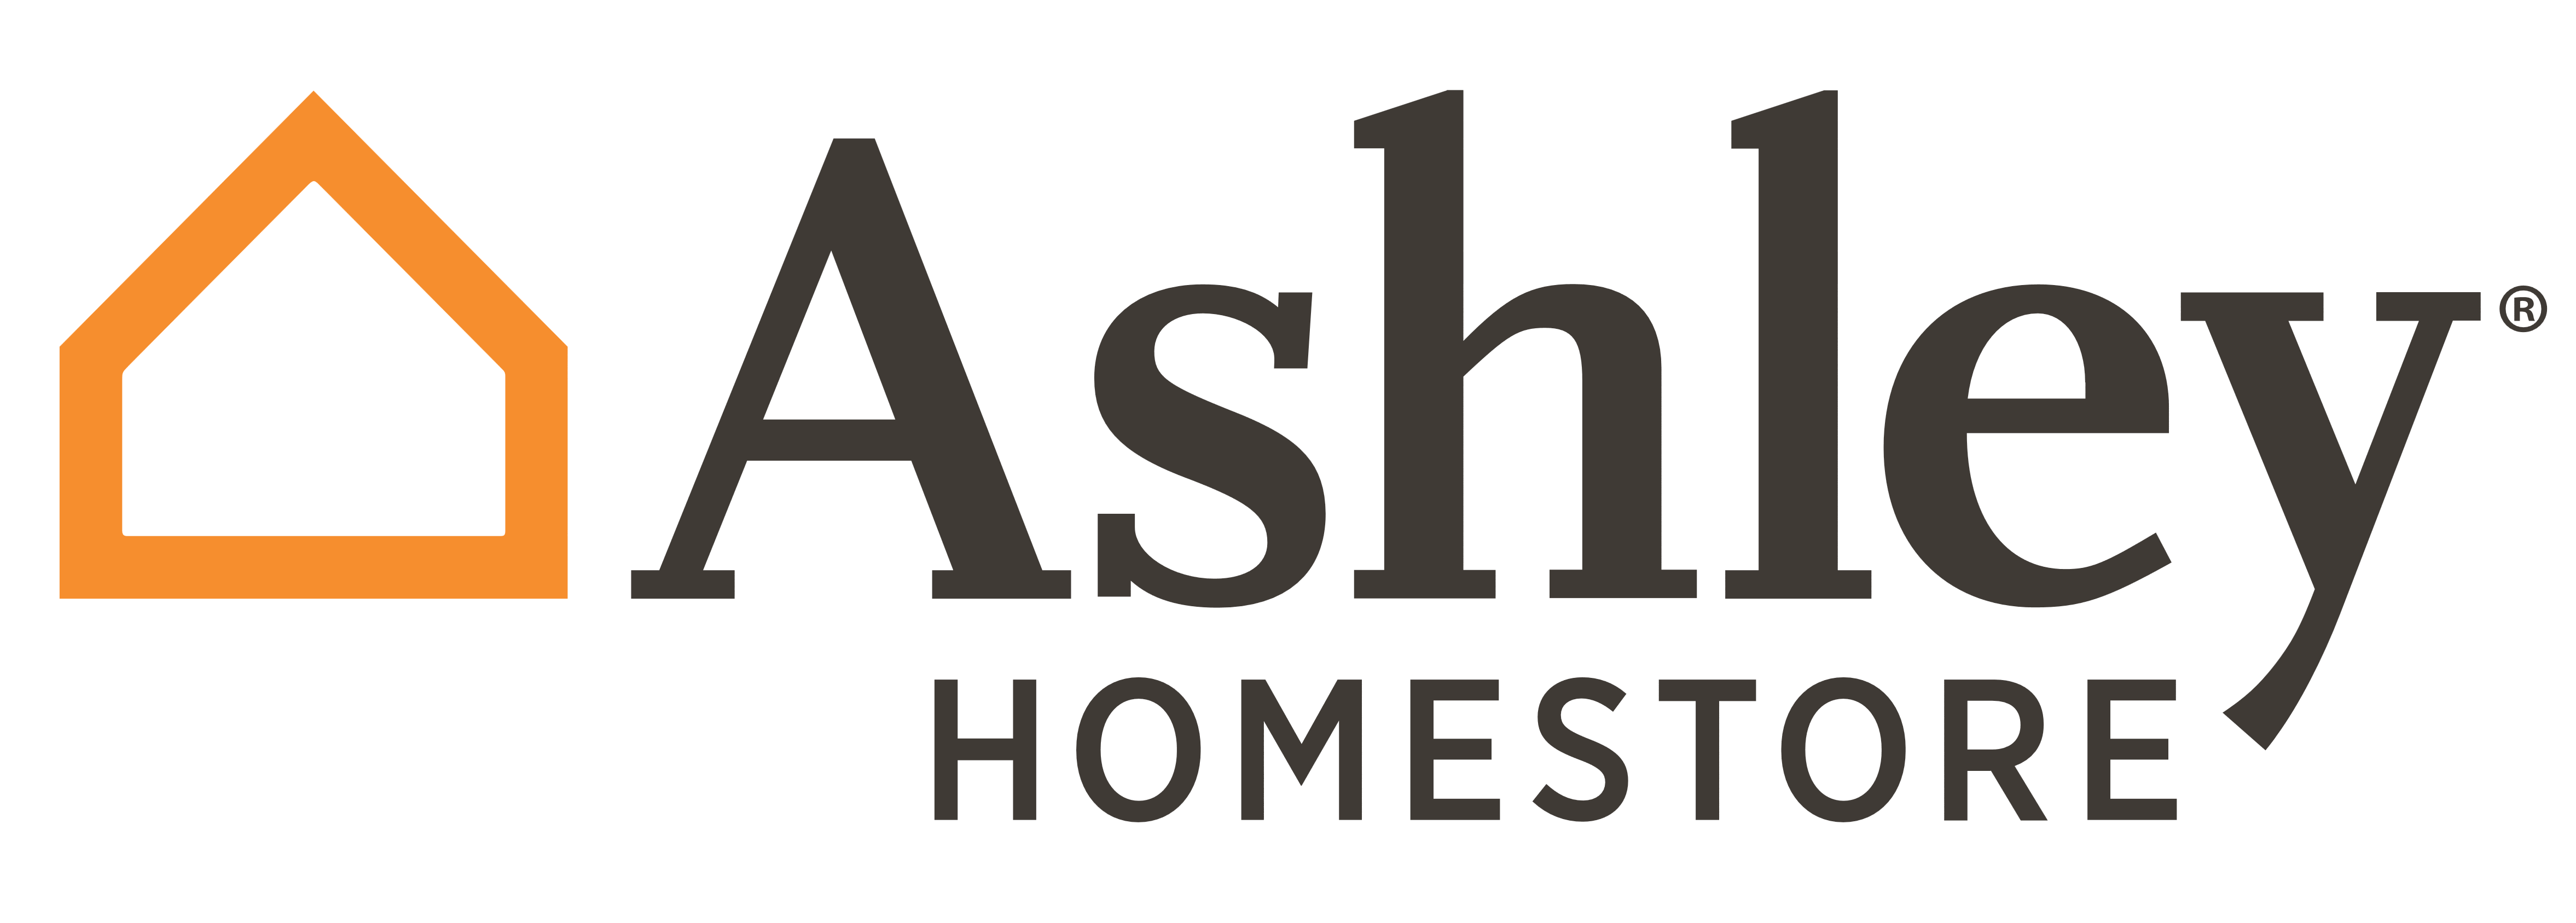 Furniture Ashley Store